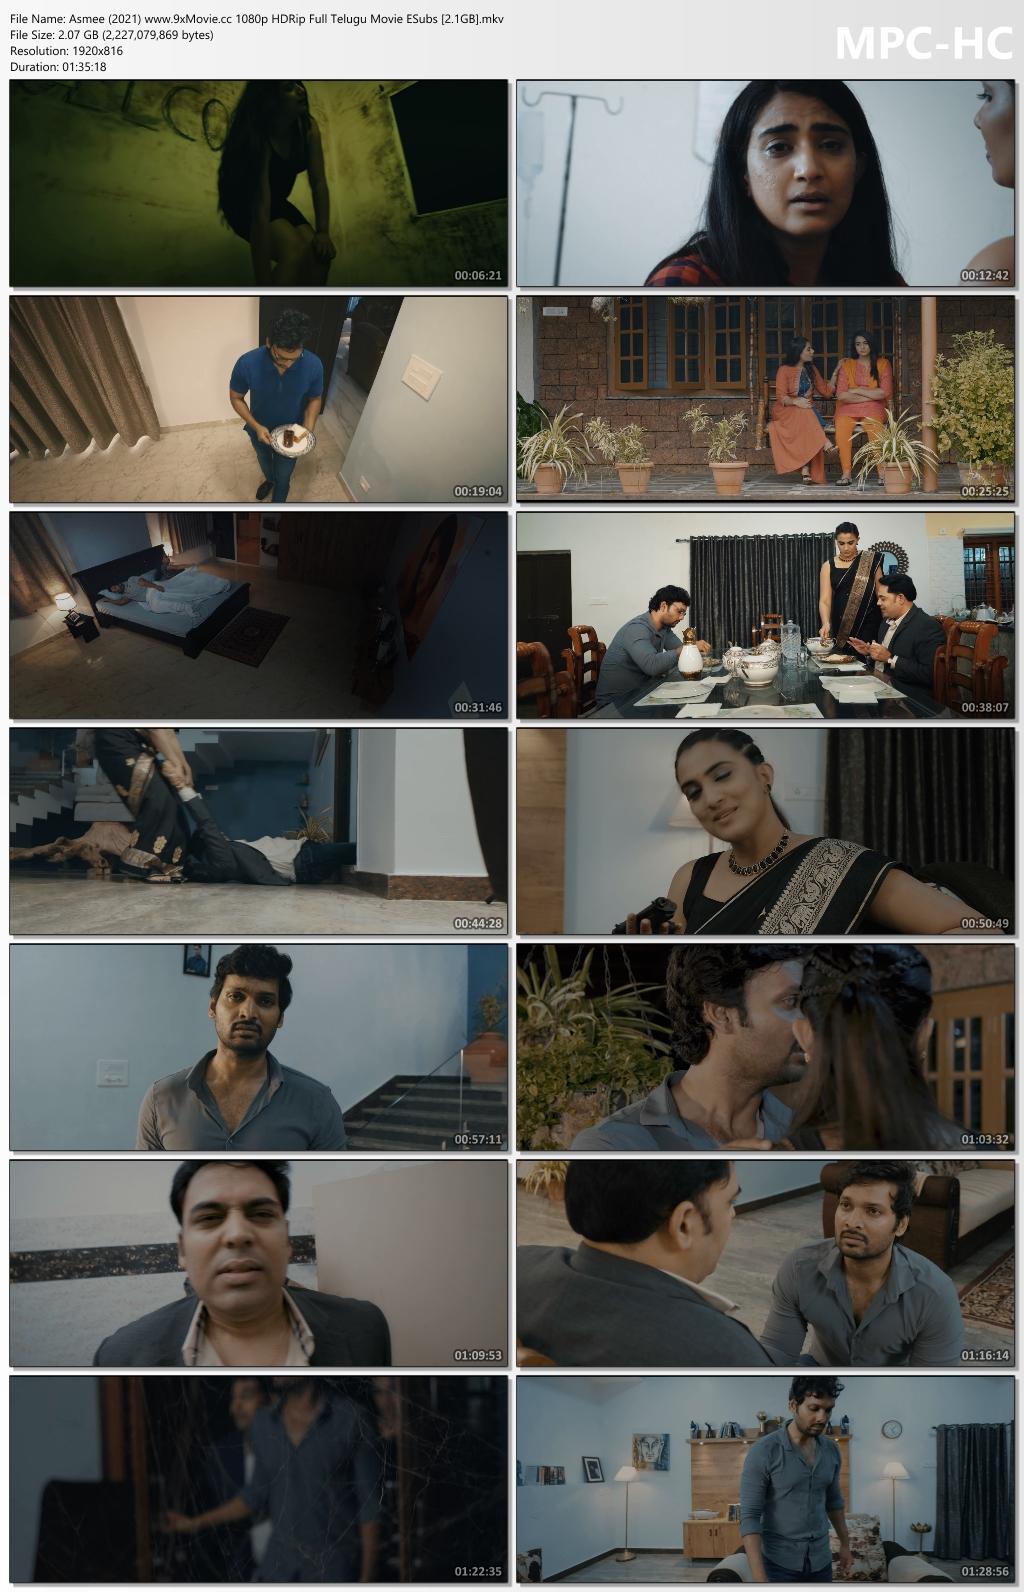 Asmee-2021-www-9x-Movie-cc-1080p-HDRip-Full-Telugu-Movie-ESubs-2-1-GB-mkv